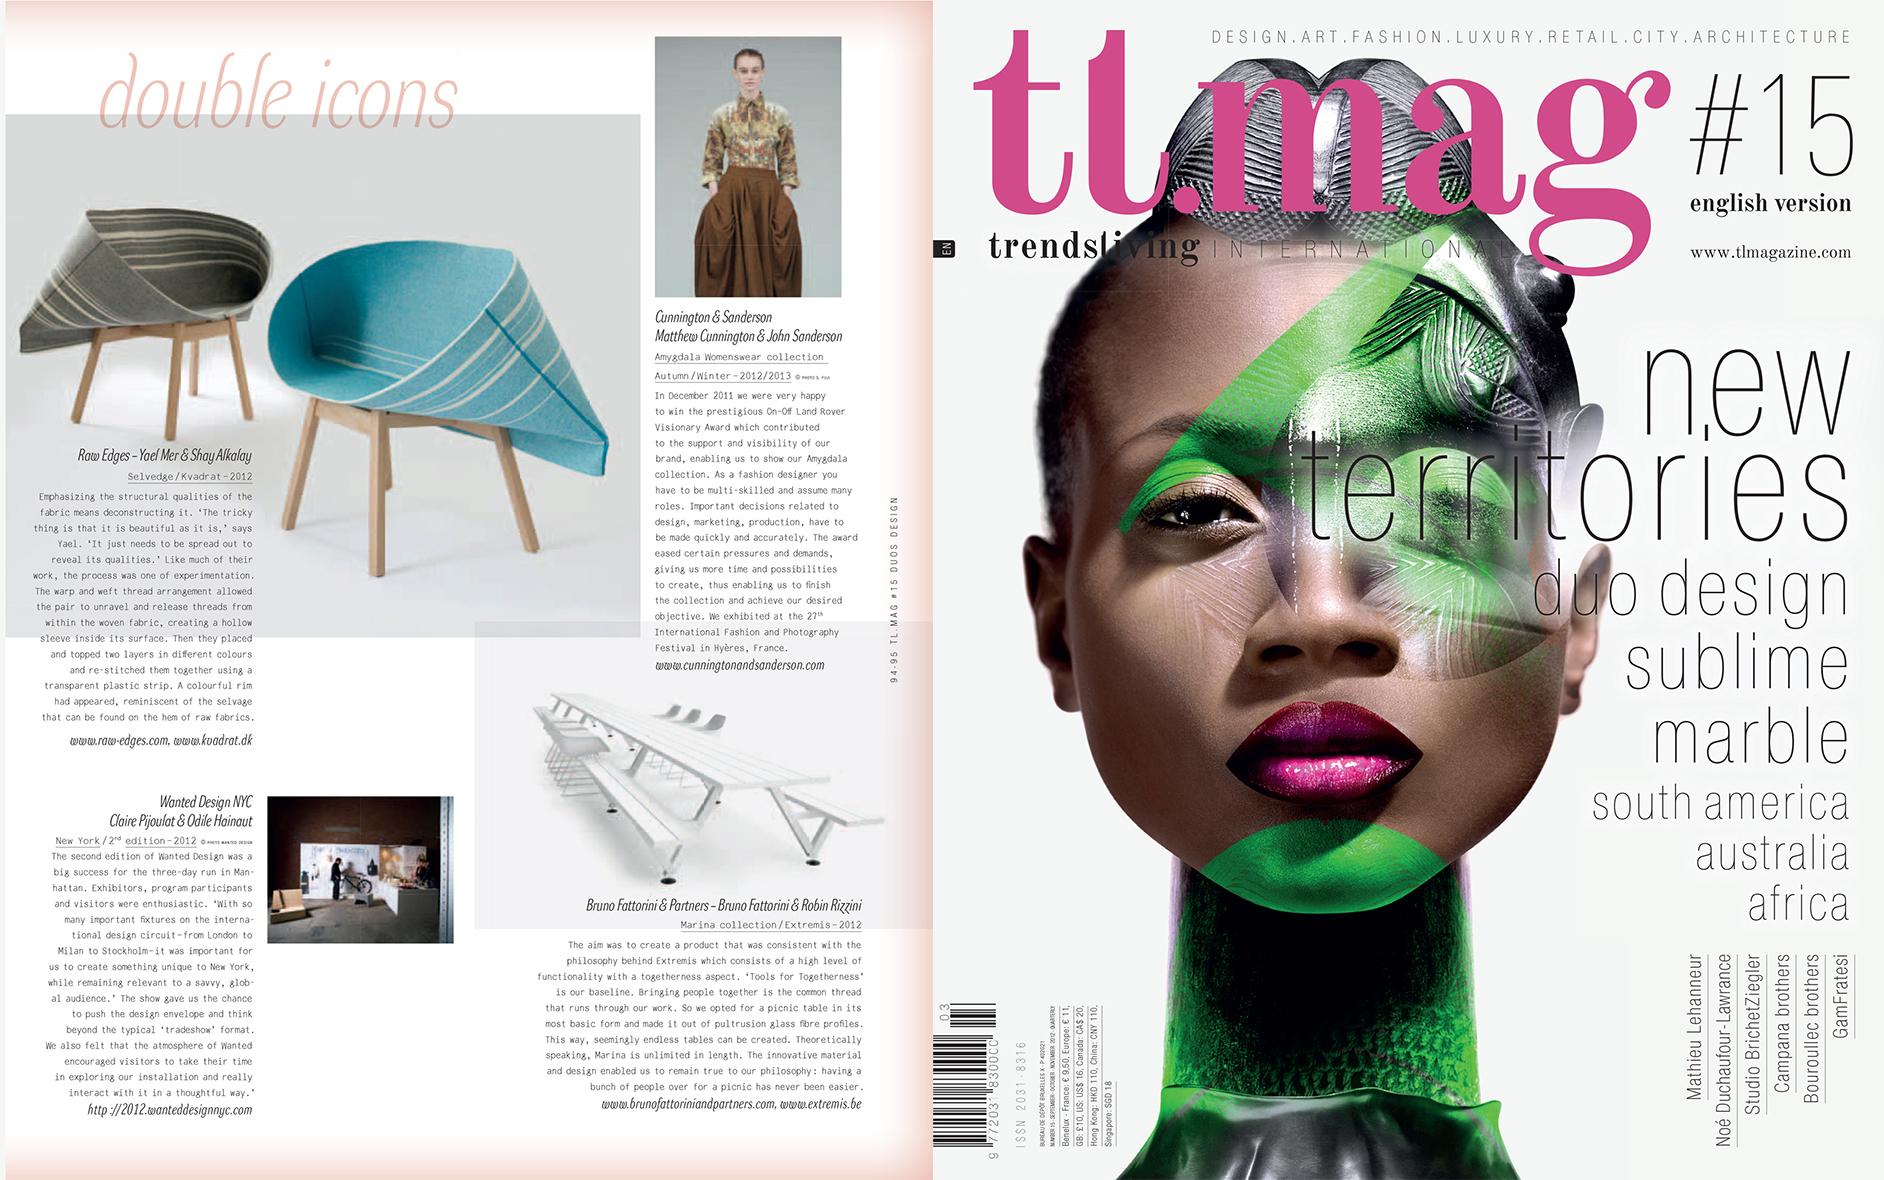 tlmag editorial duo designers